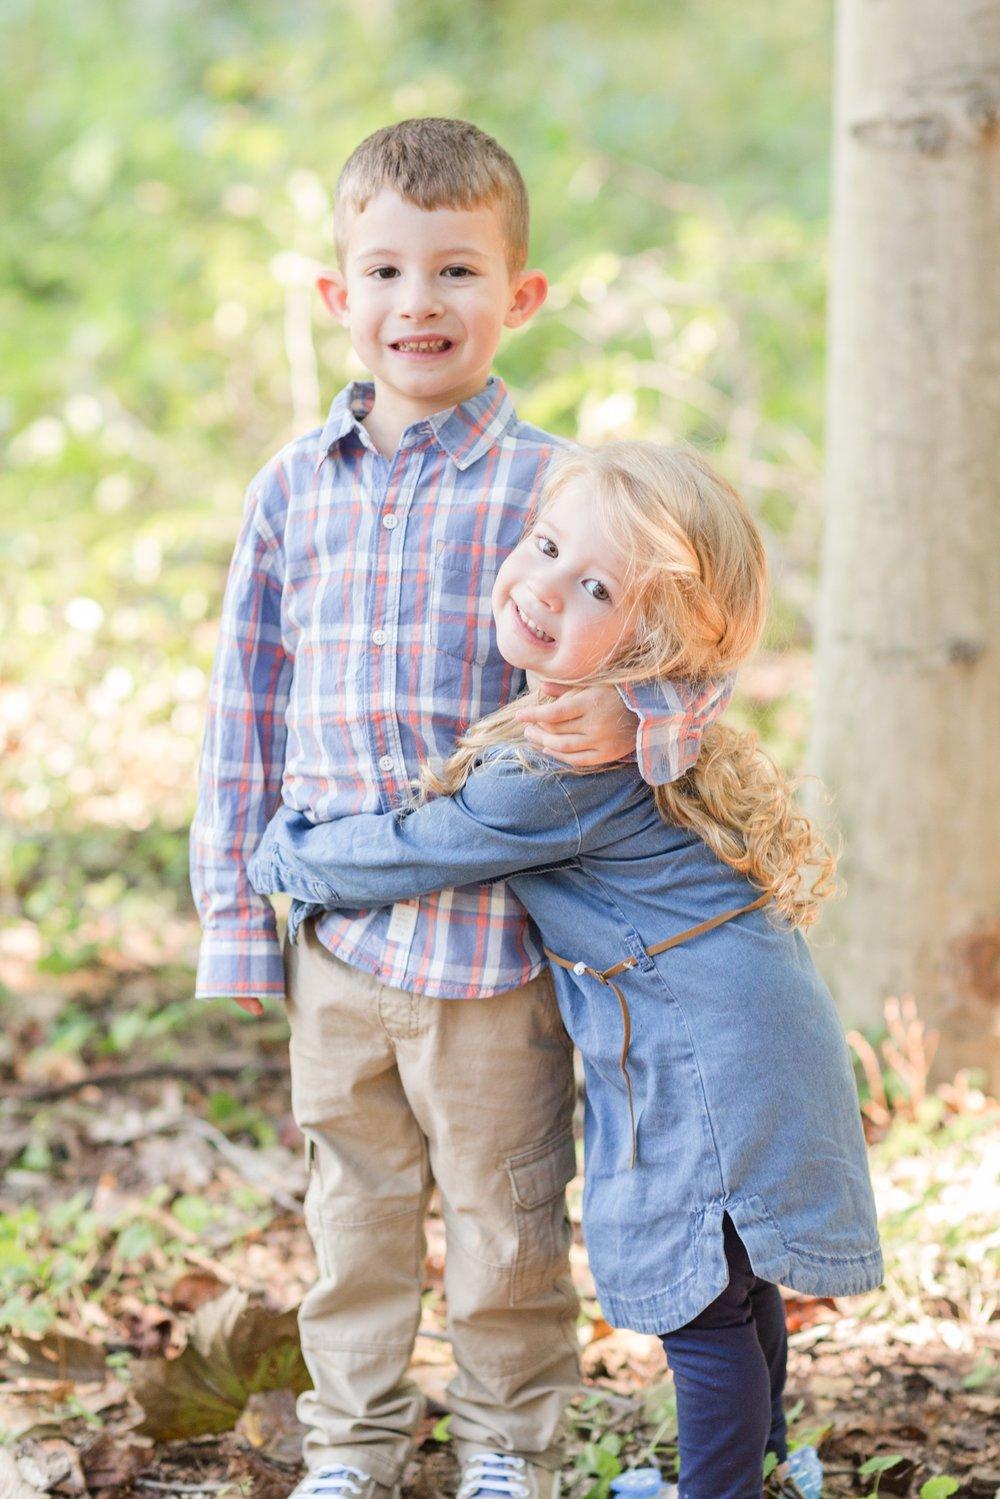 Benesch Family Mini Session 2018-87_Jerusalem-Mill-Maryland-Family-Photographer-anna-grace-photography-photo.jpg